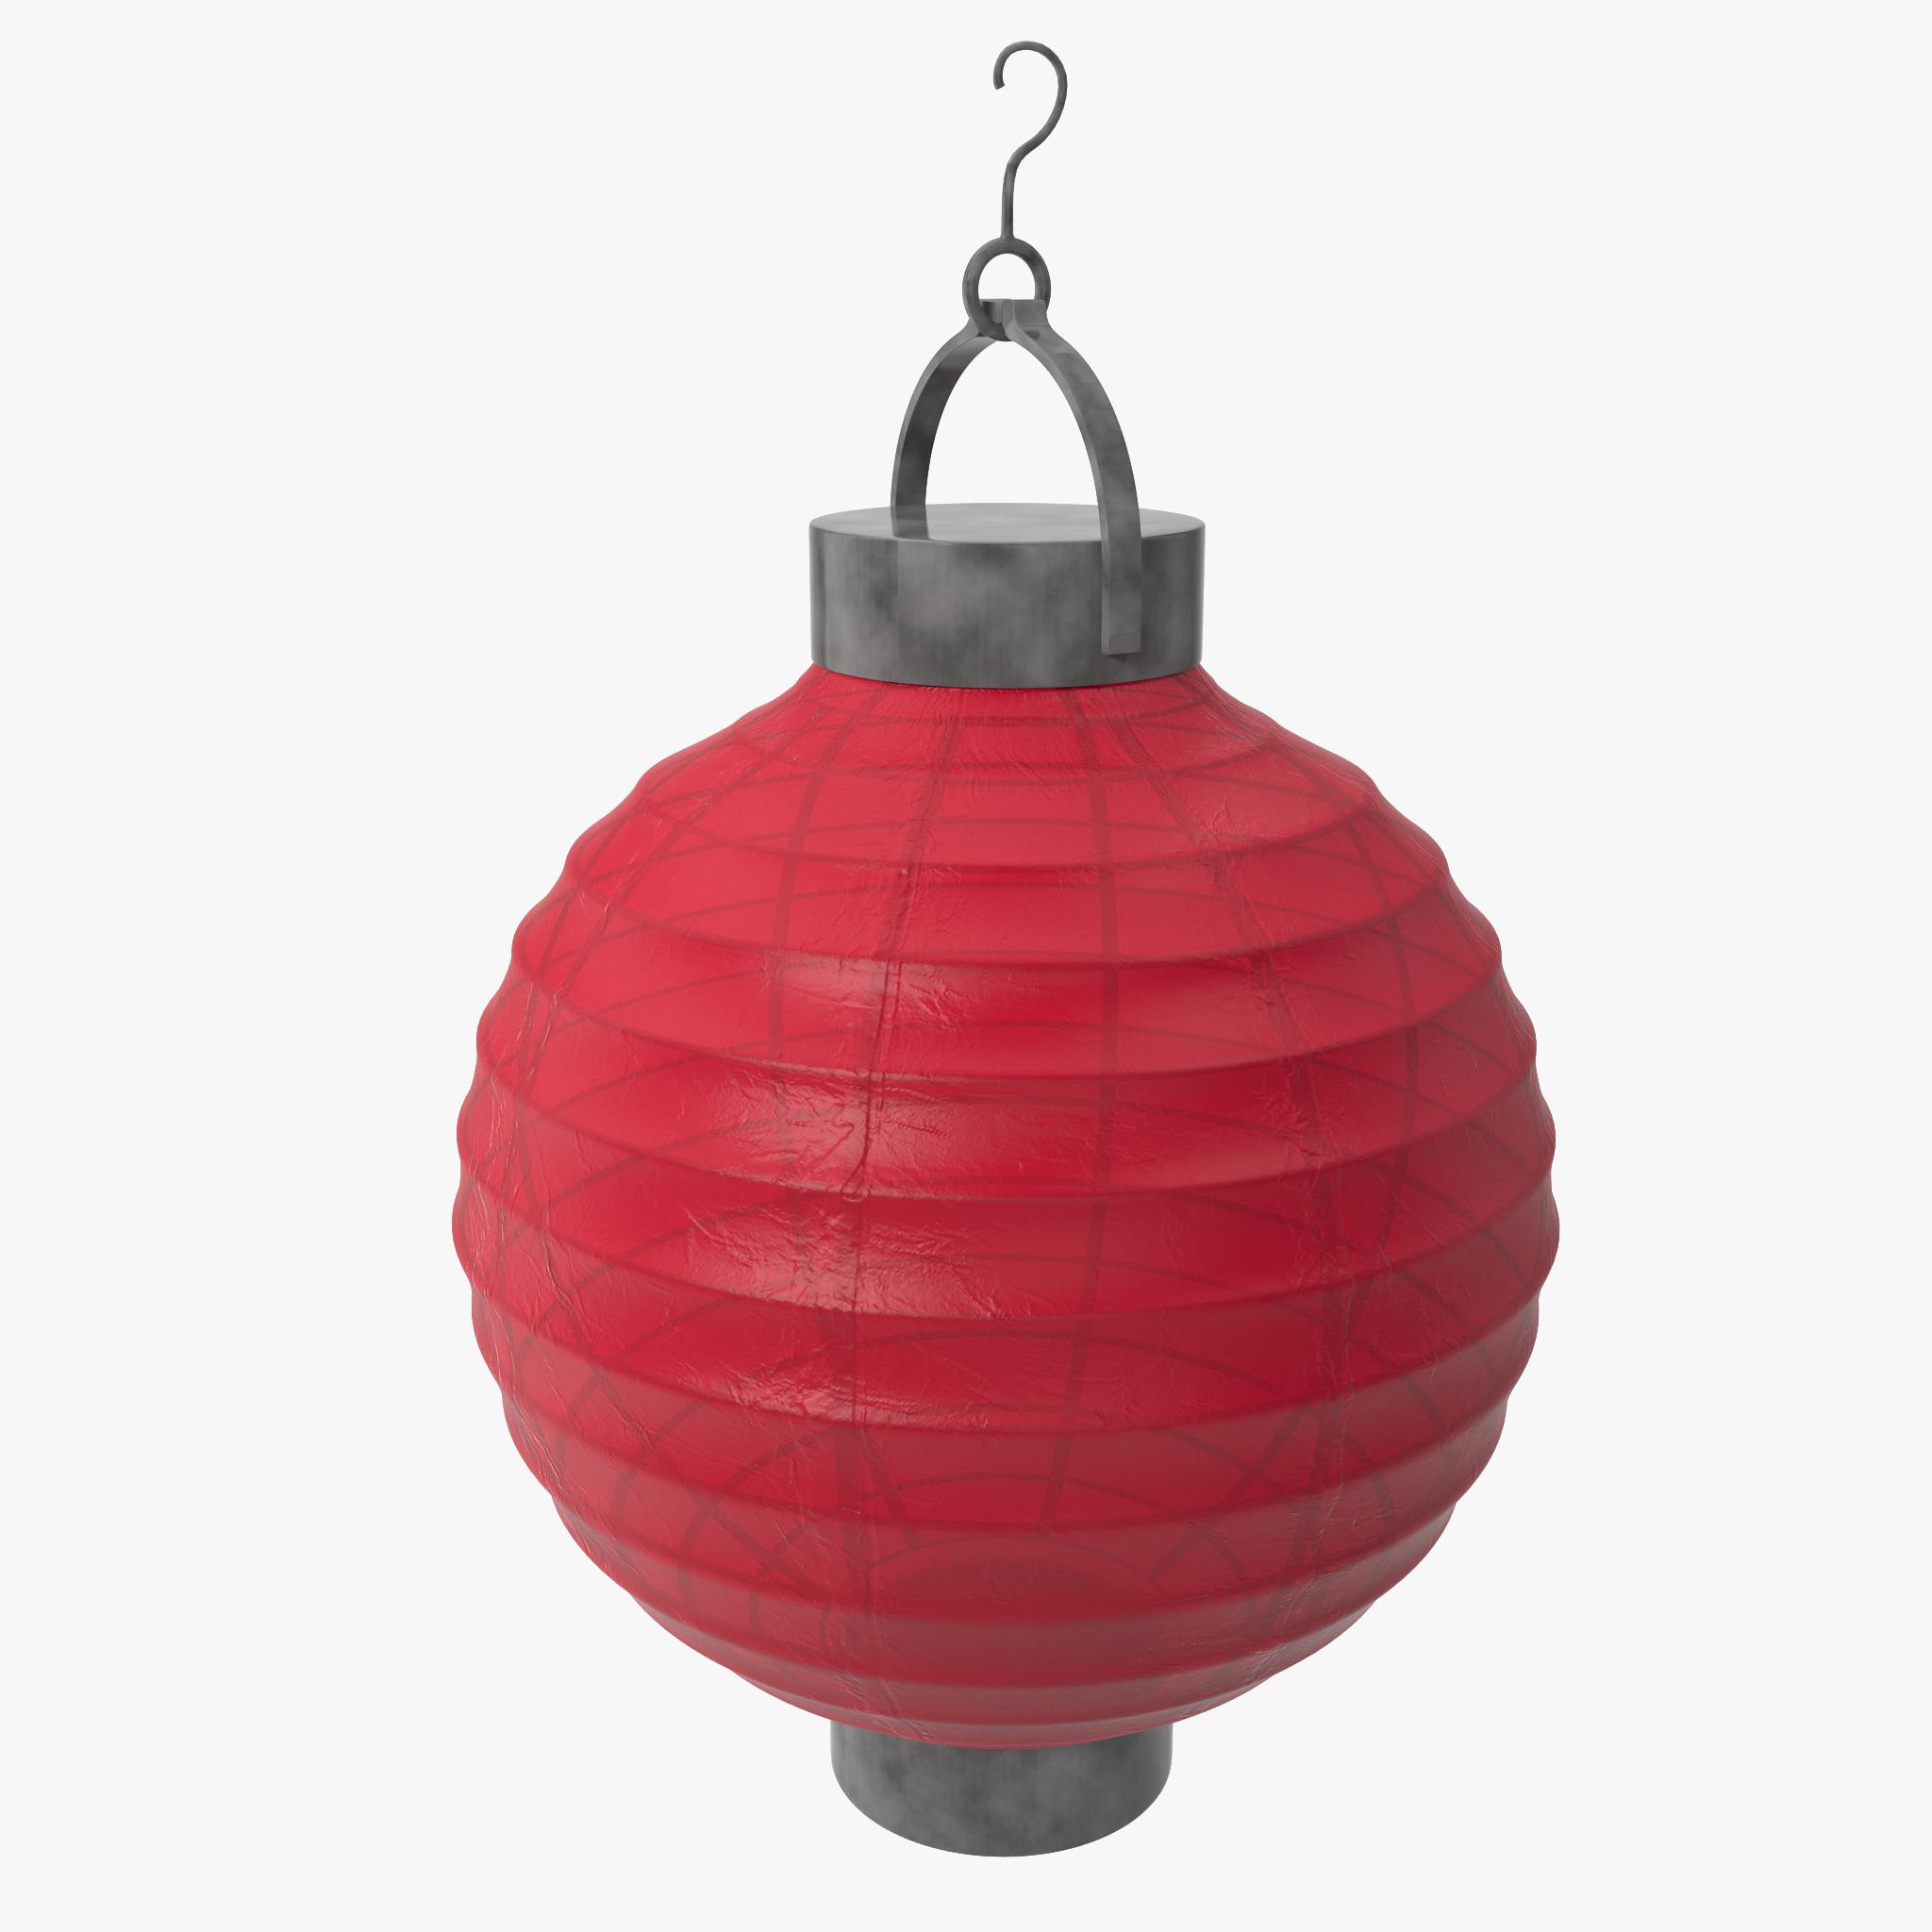 paper lantern design 3d model